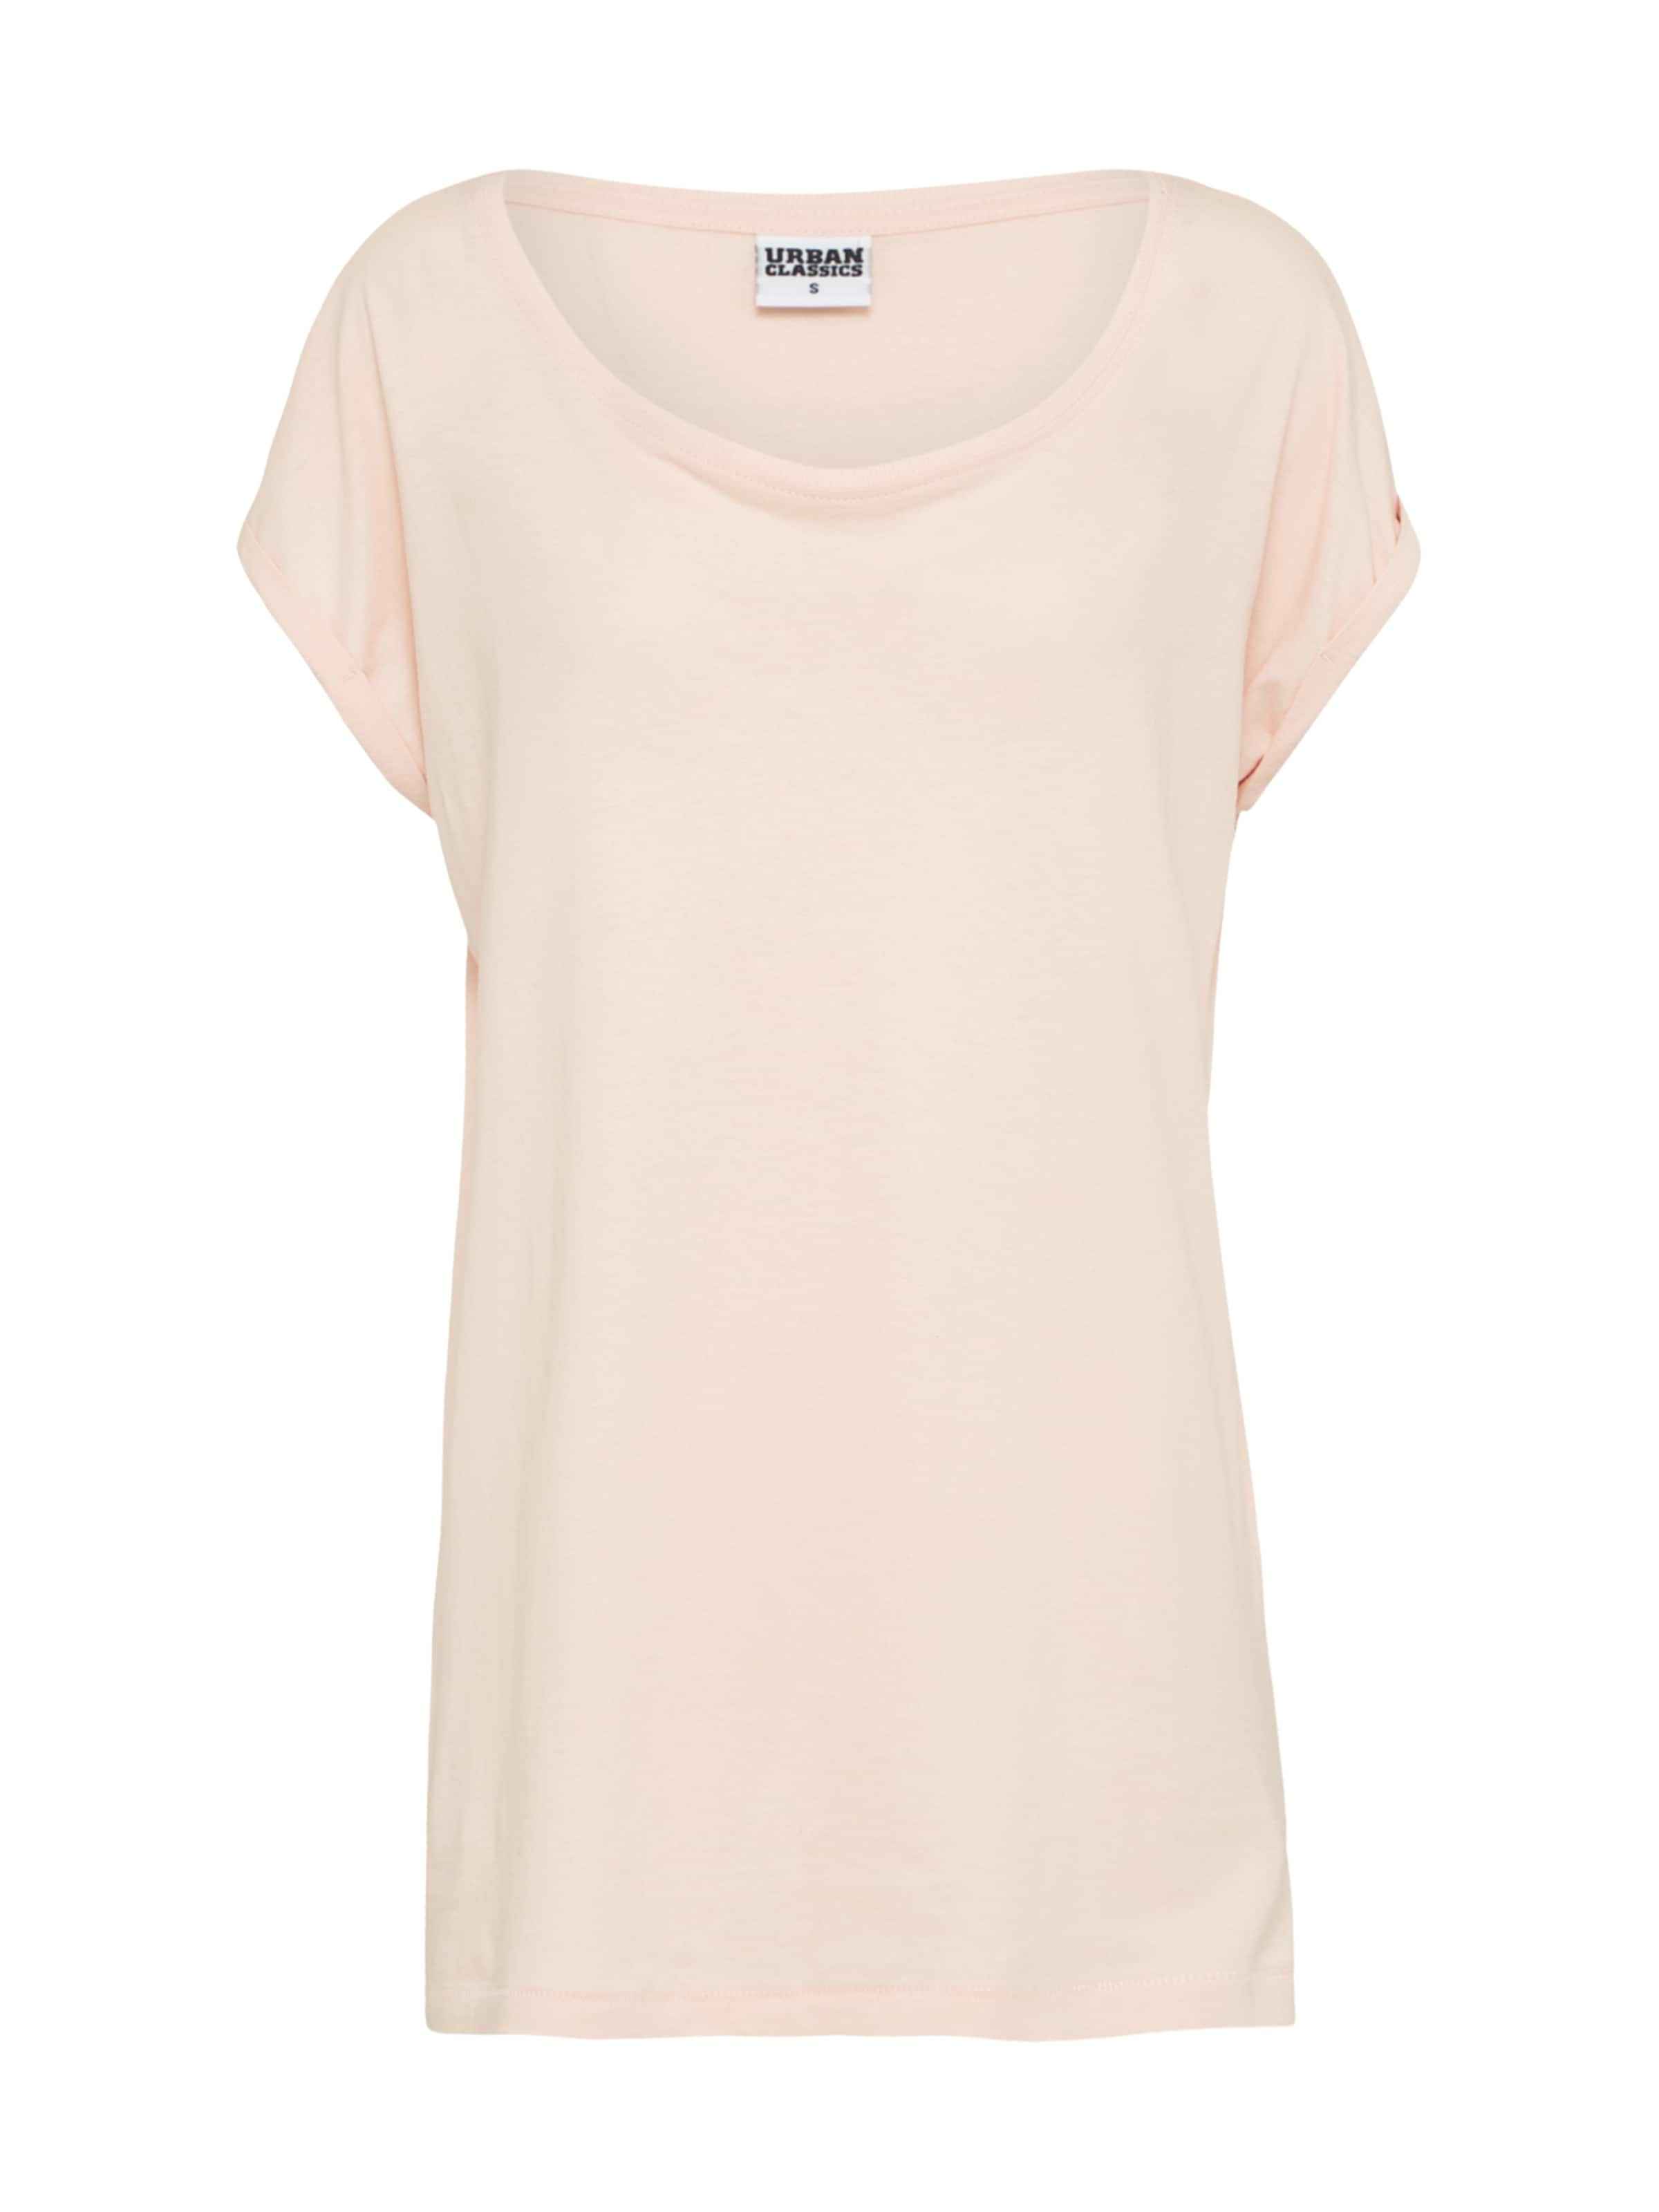 Urban Classics Shoulder' Curvy 'extended Rosa In shirt T kXOZuPi